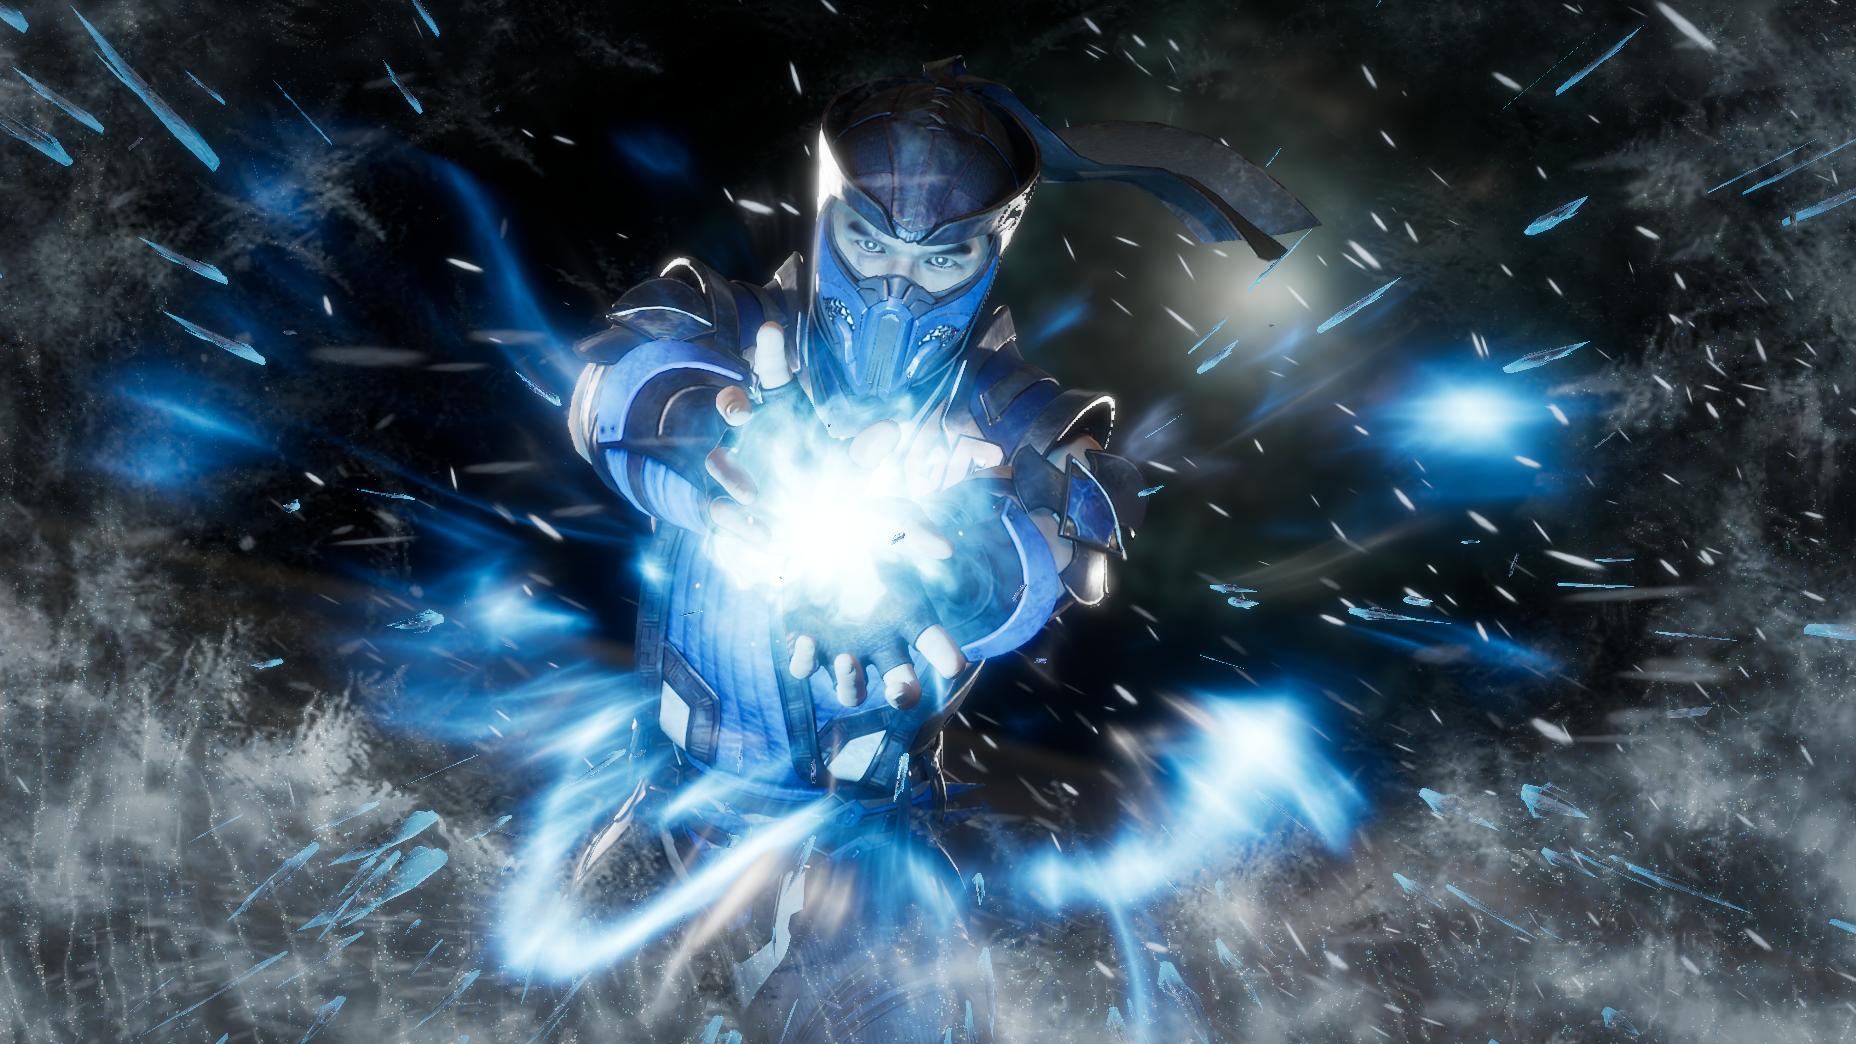 Sub-Zero Can Turn Invisible In Mortal Kombat 11 With A Very Specific Glitch